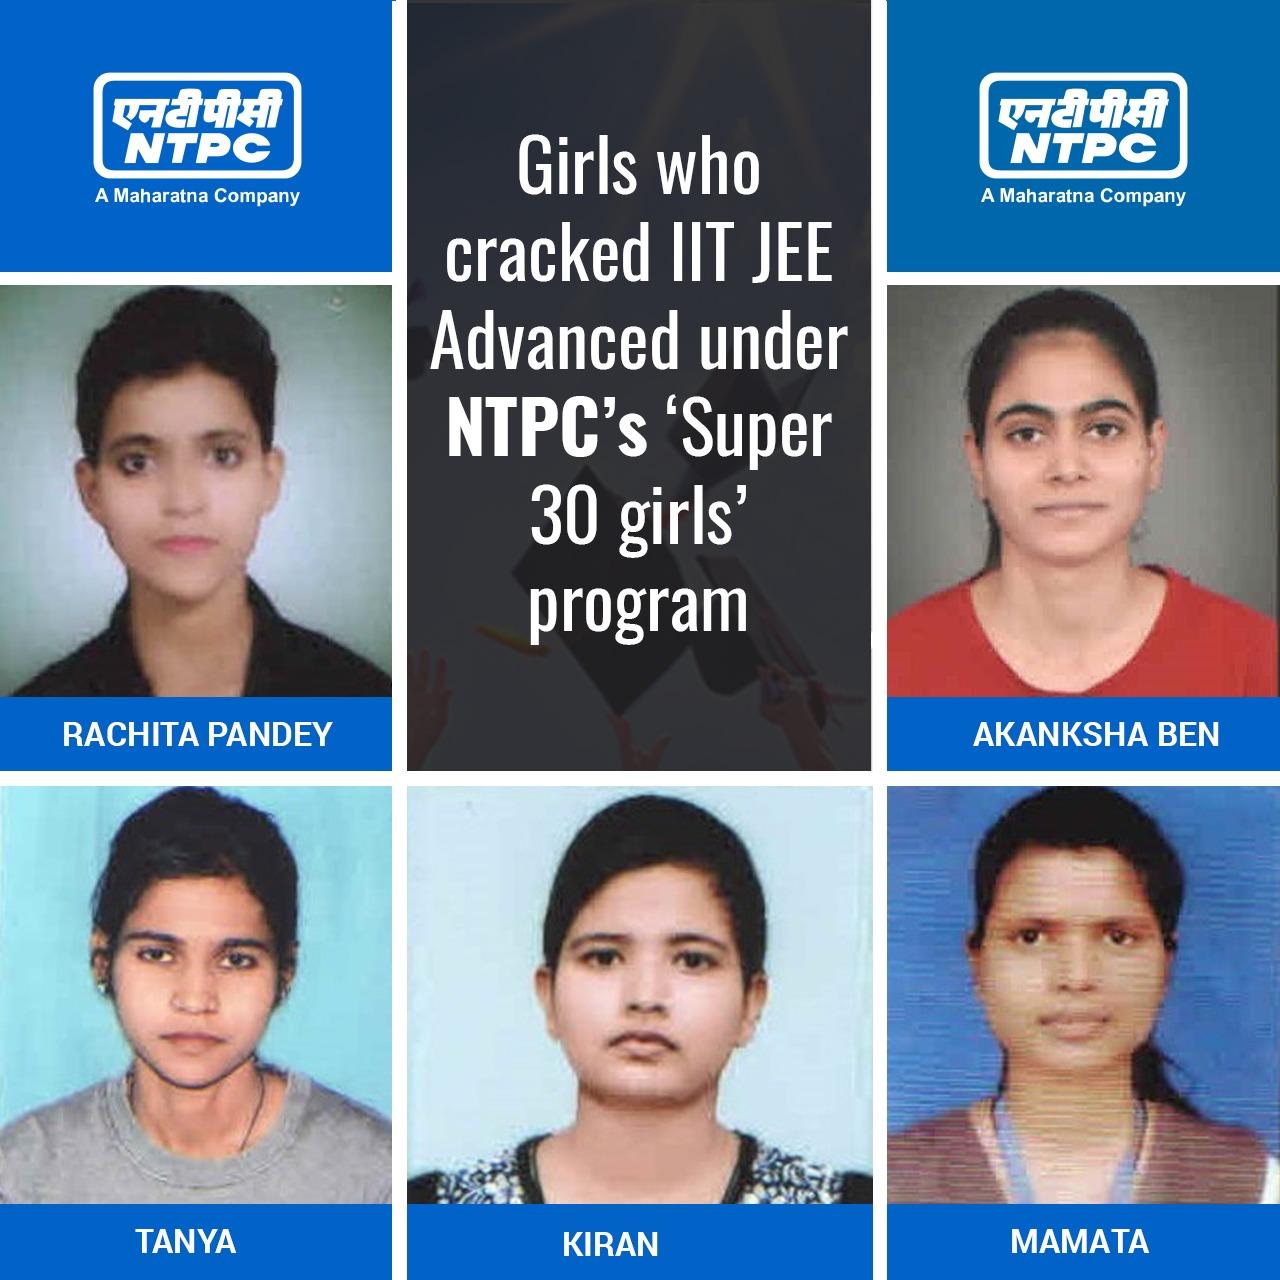 NTPC's 'Super 30 Girls' shine at IIT JEE